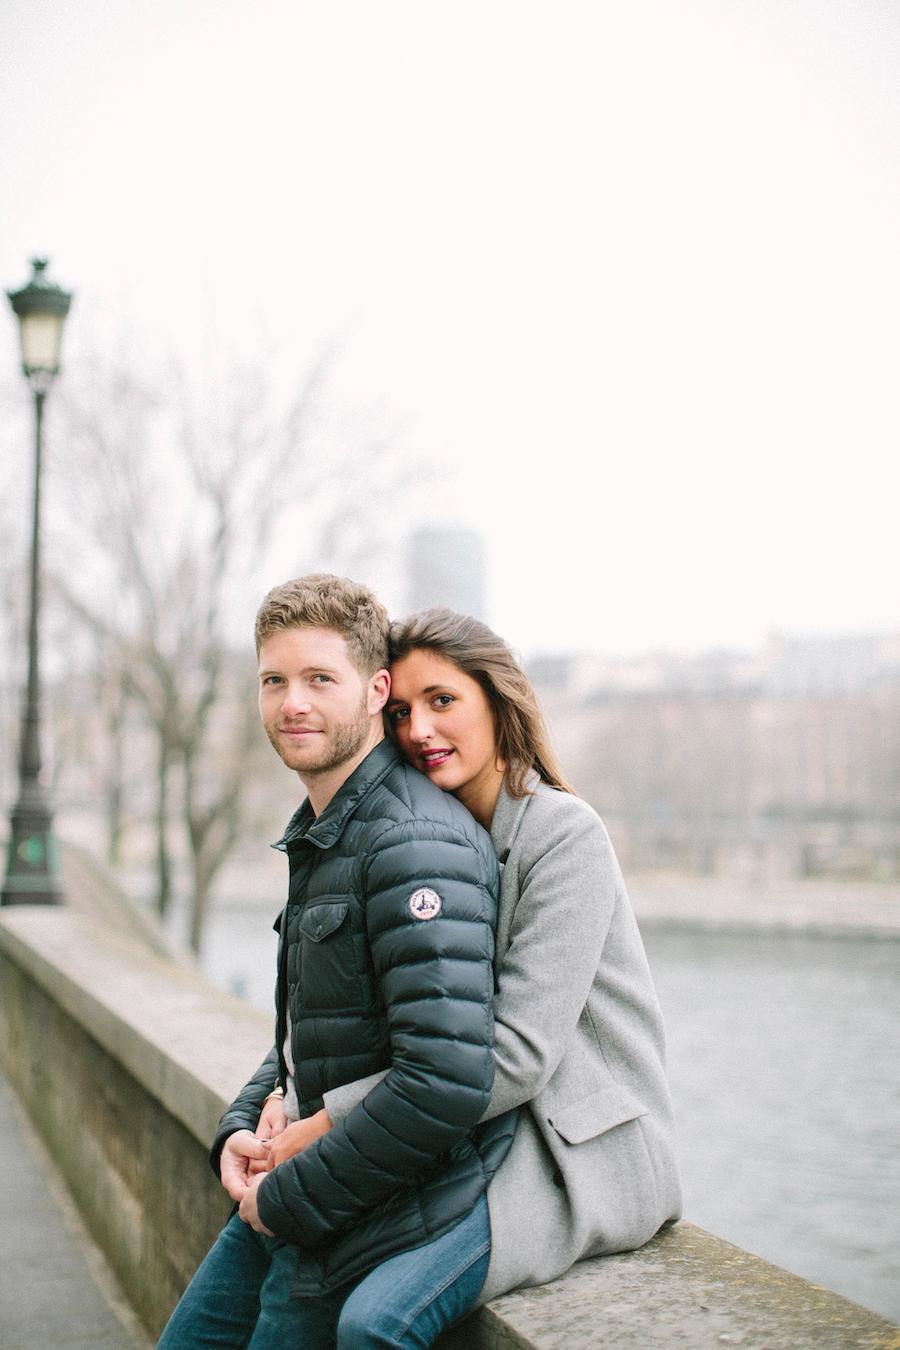 saya-photography-pre-wedding-couple-engagement-paris-quartier-latin-39.jpg